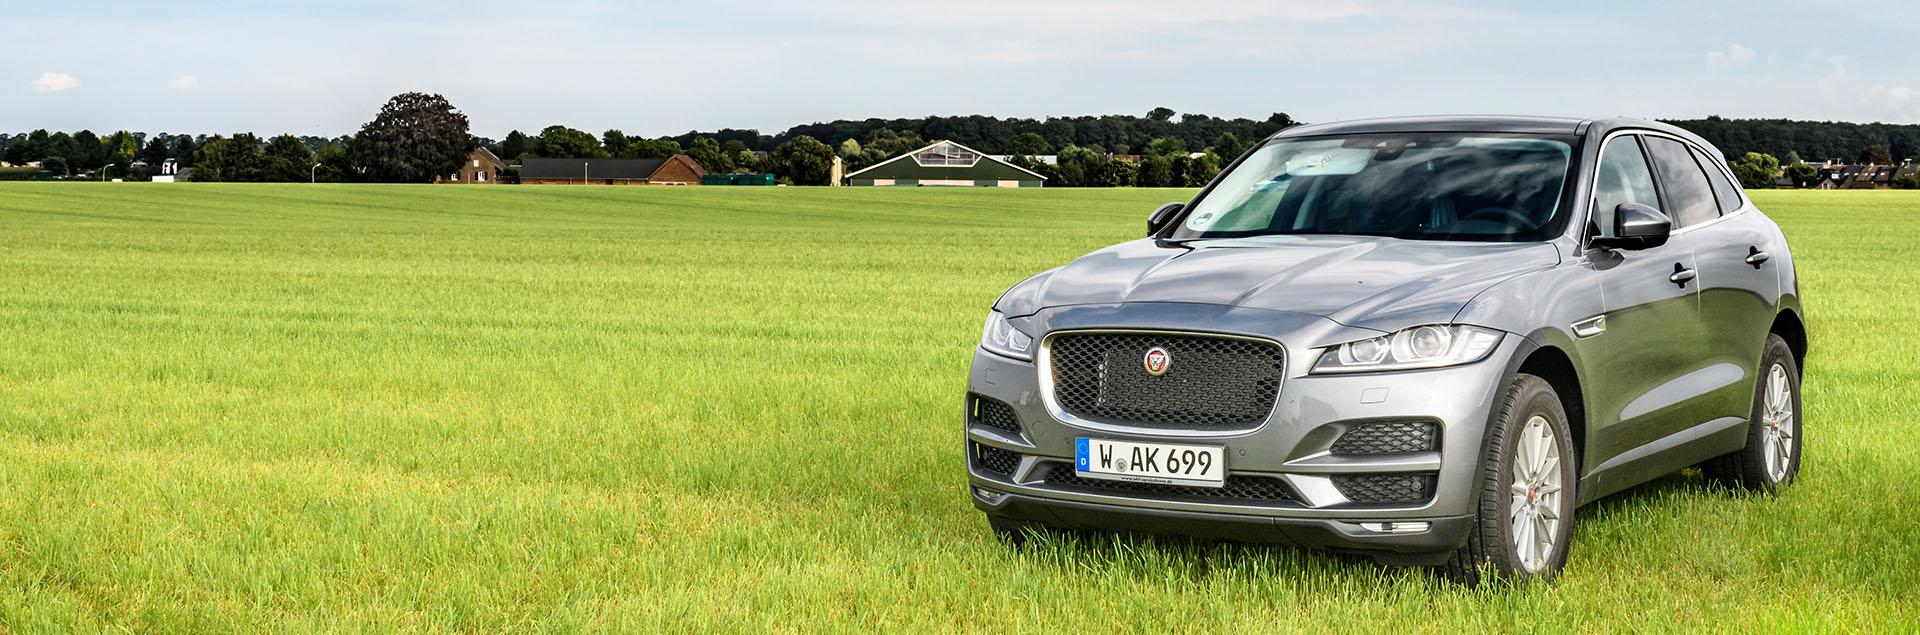 Jaguar Gebrauchtwagen bestellen